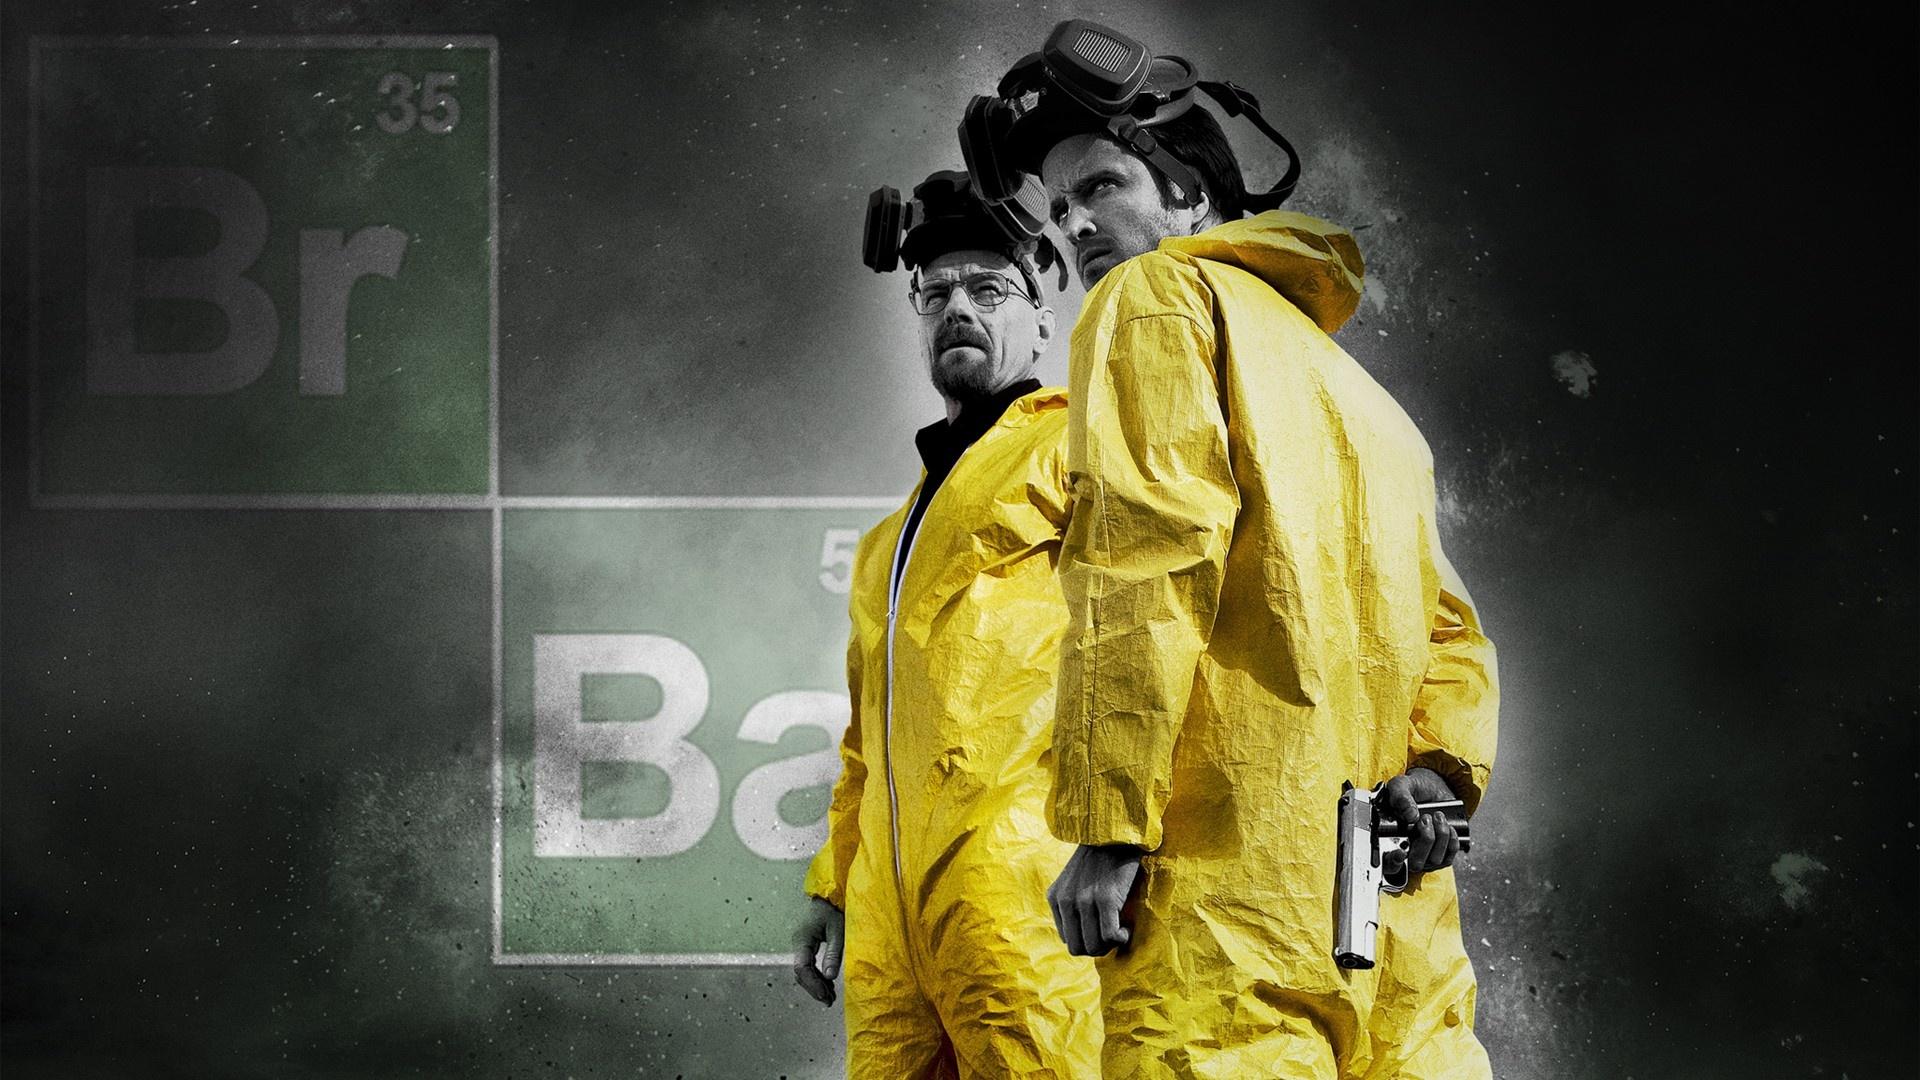 Breaking Bad background wallpaper